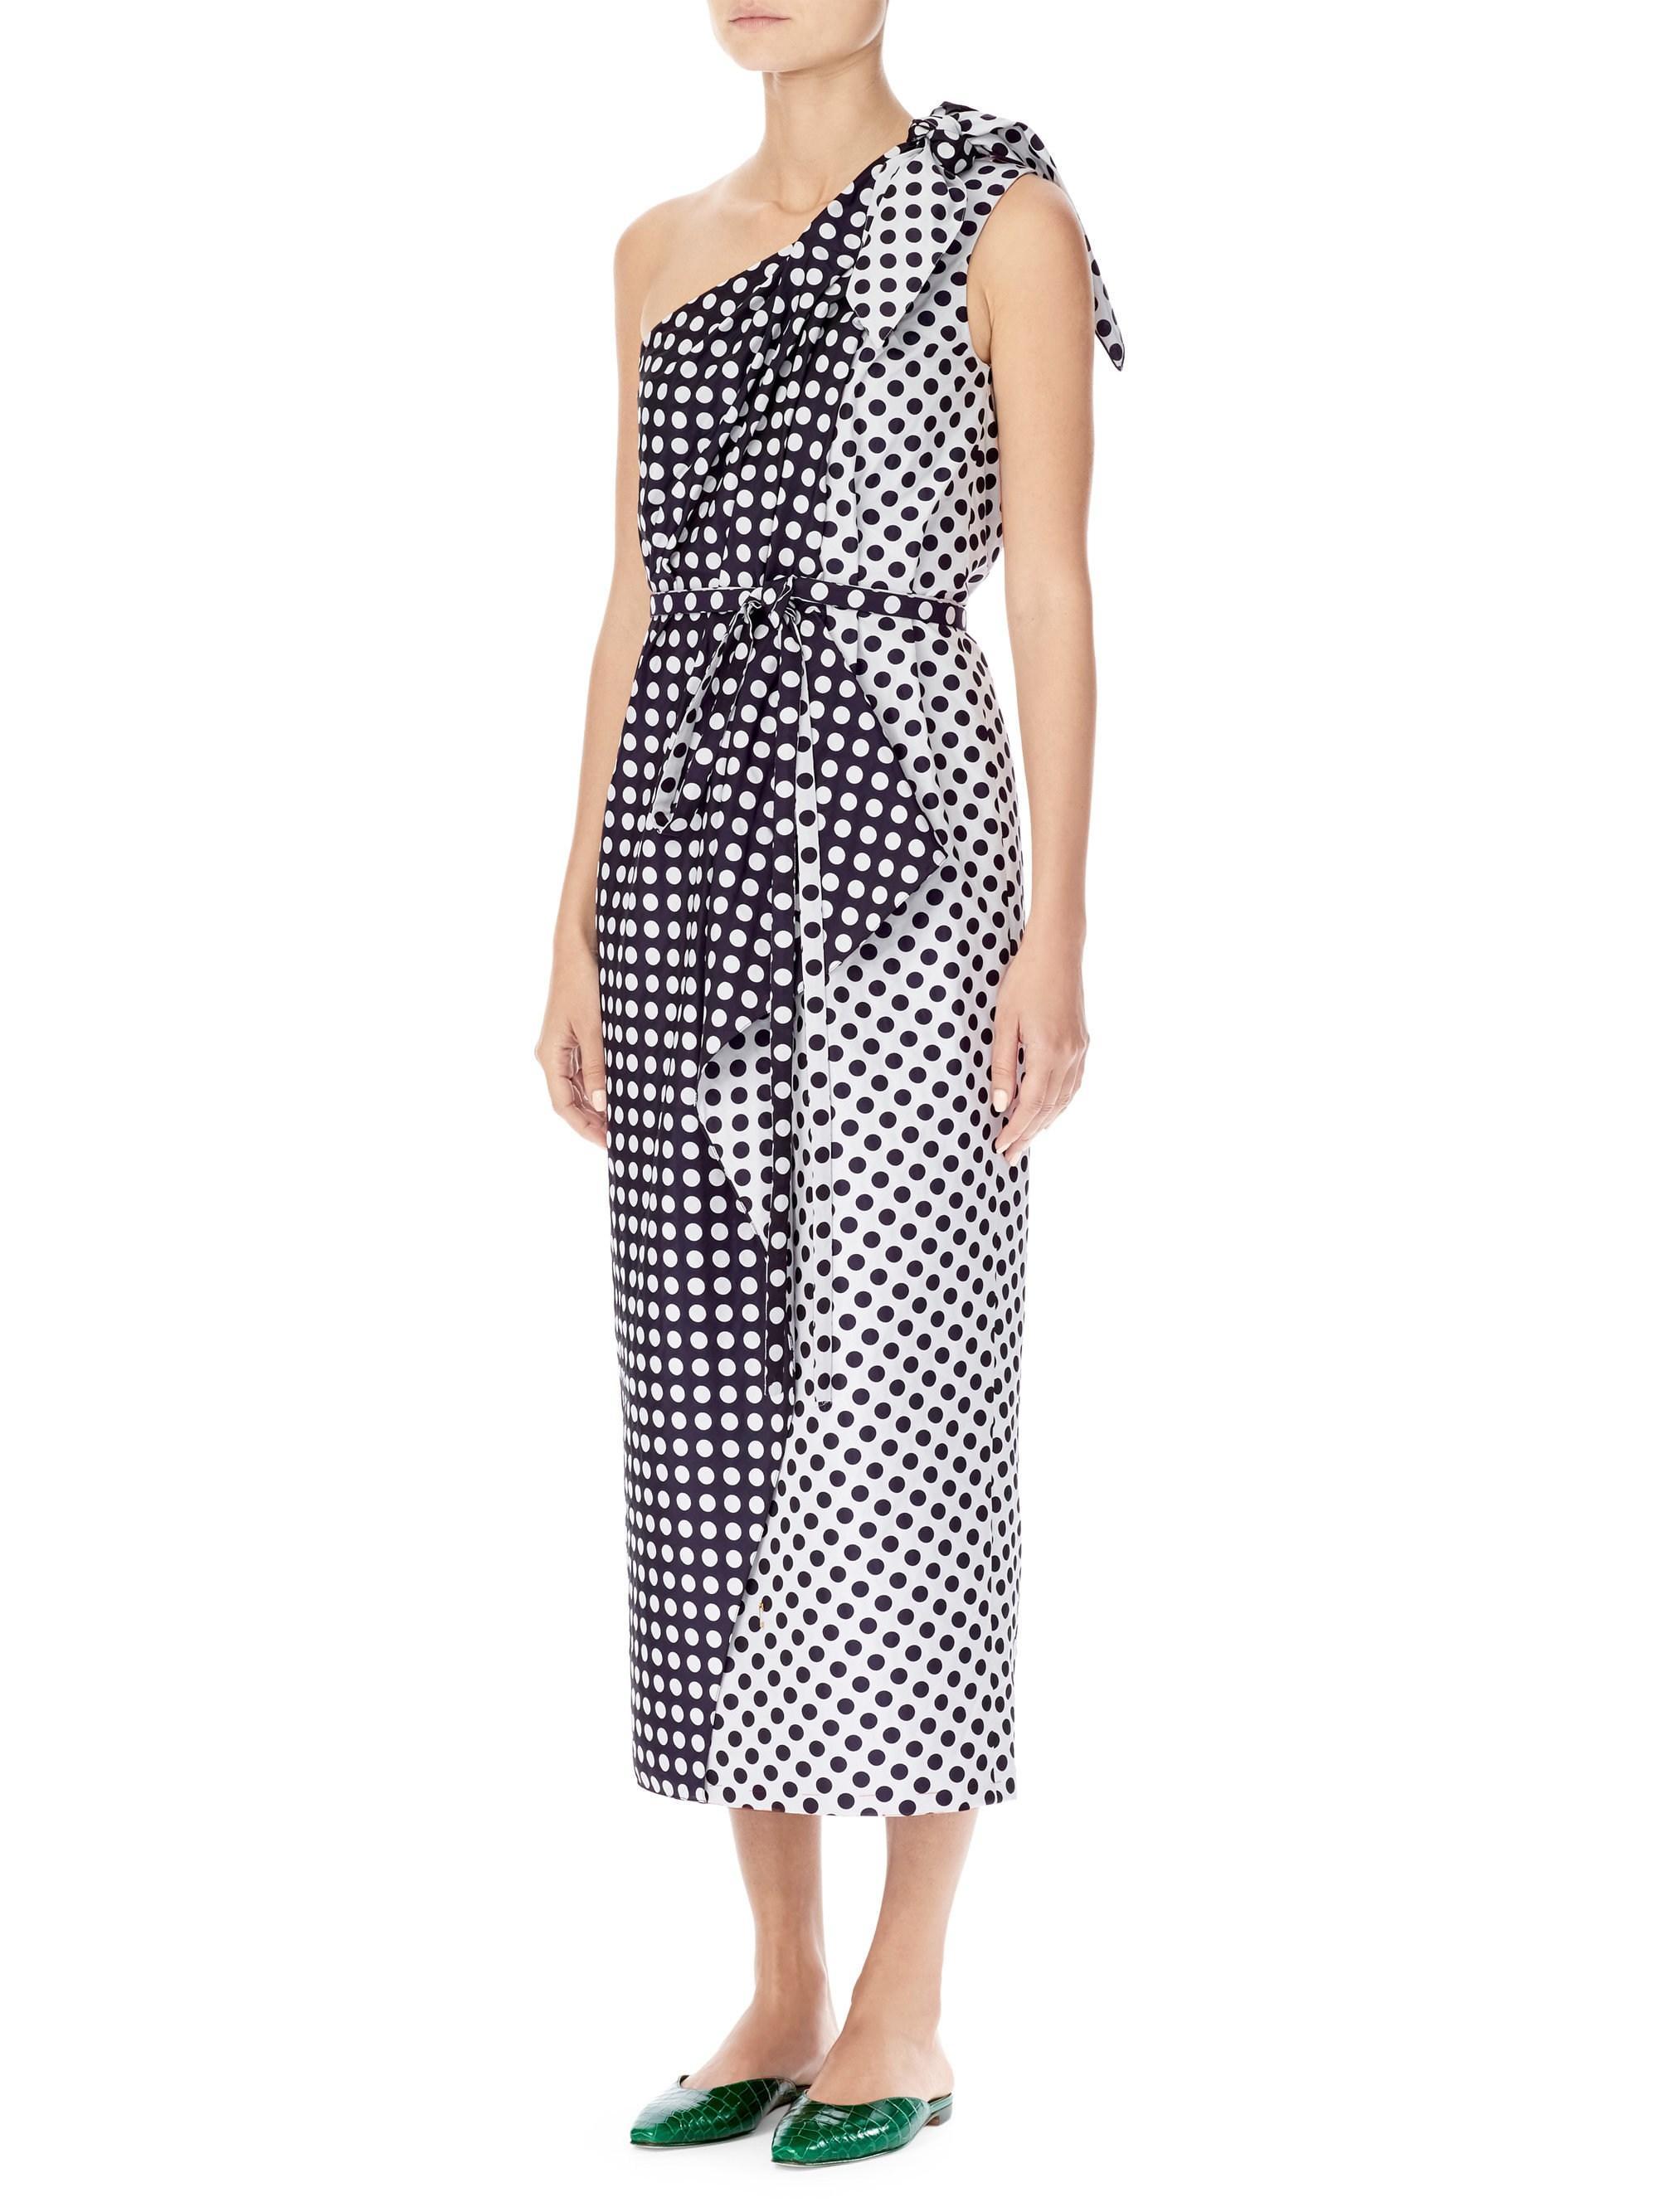 cff7b9573ad Lyst - Carolina Herrera Women s One-shoulder Polka Dot Dress ...